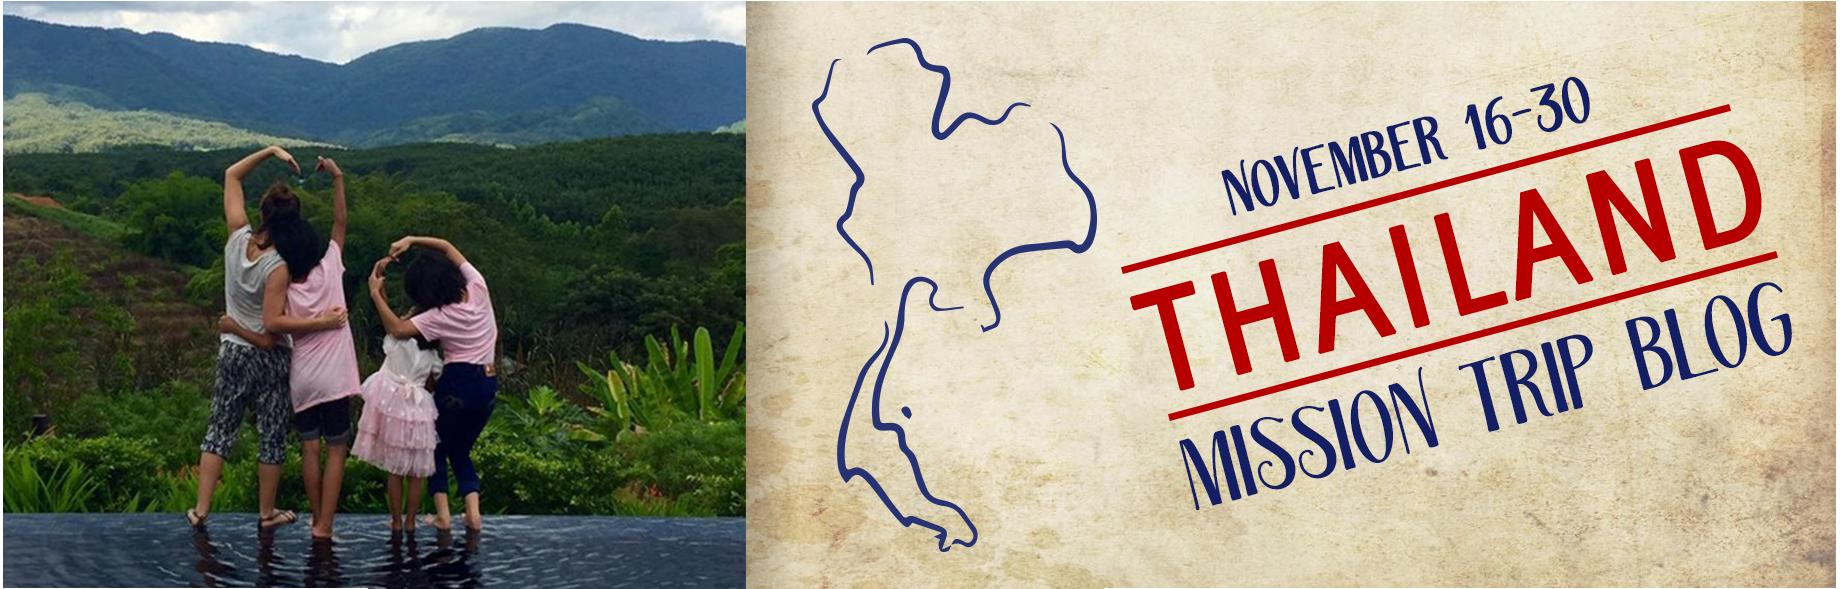 2016 Thailand Mission Trip